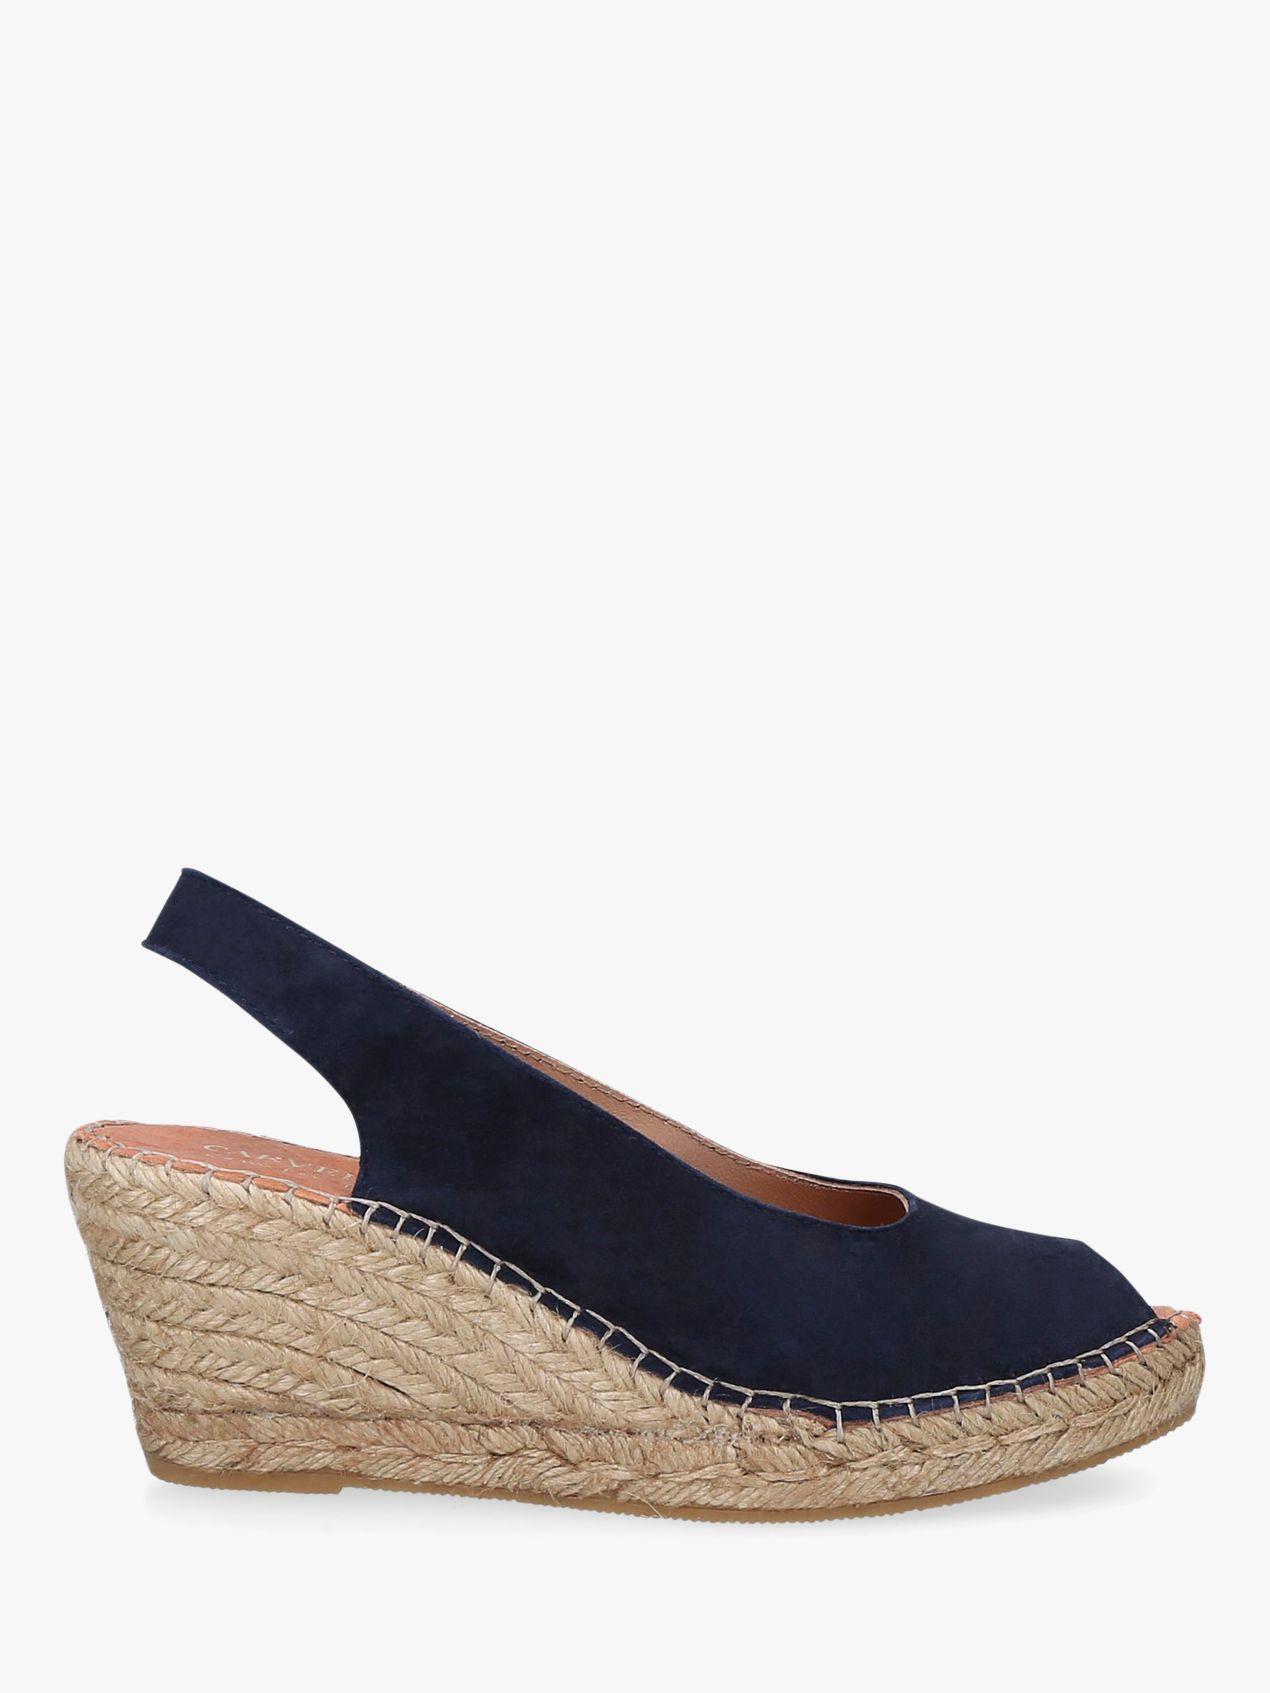 Carvela Comfort Carvela Comfort Sharon Wedge Heel Espadrille Sandals, Navy Blue